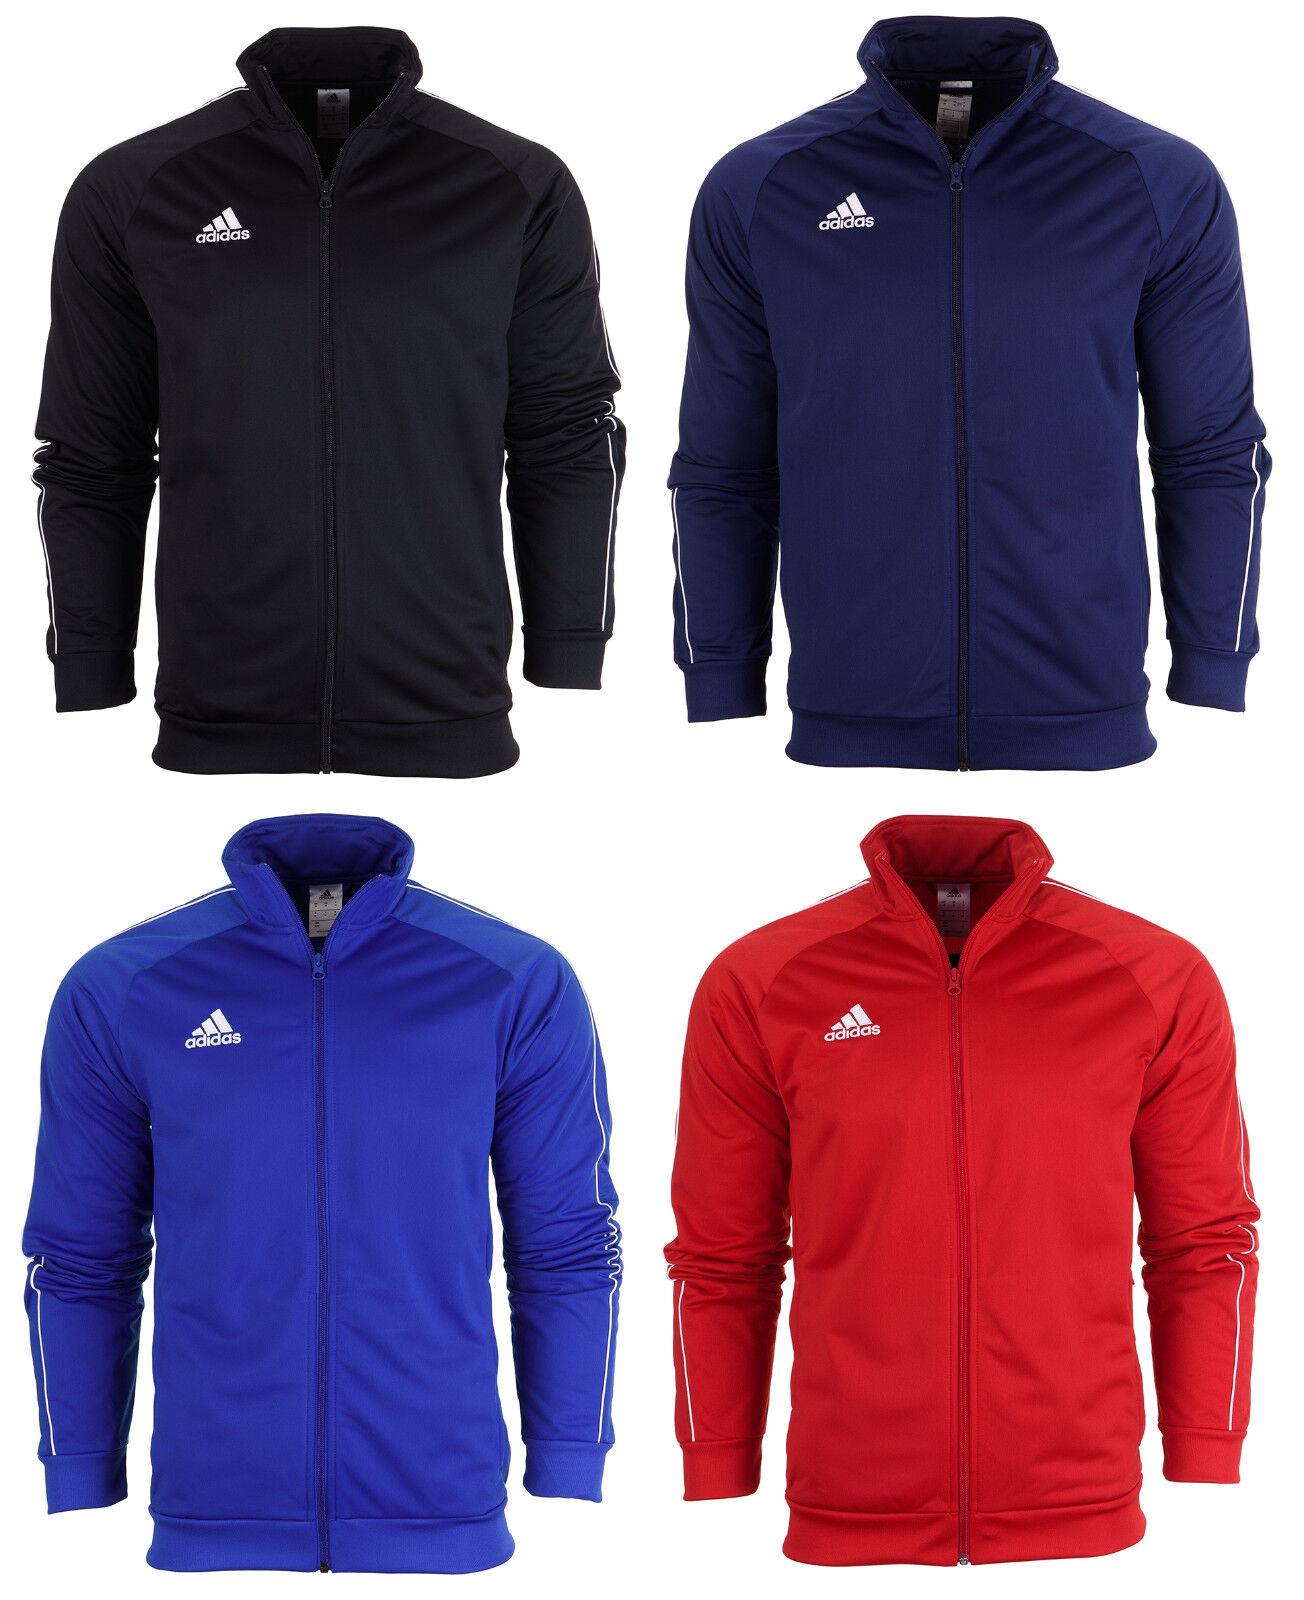 Adidas Core 18 Herren Trainingsjacke Jacket Track Top Jacke